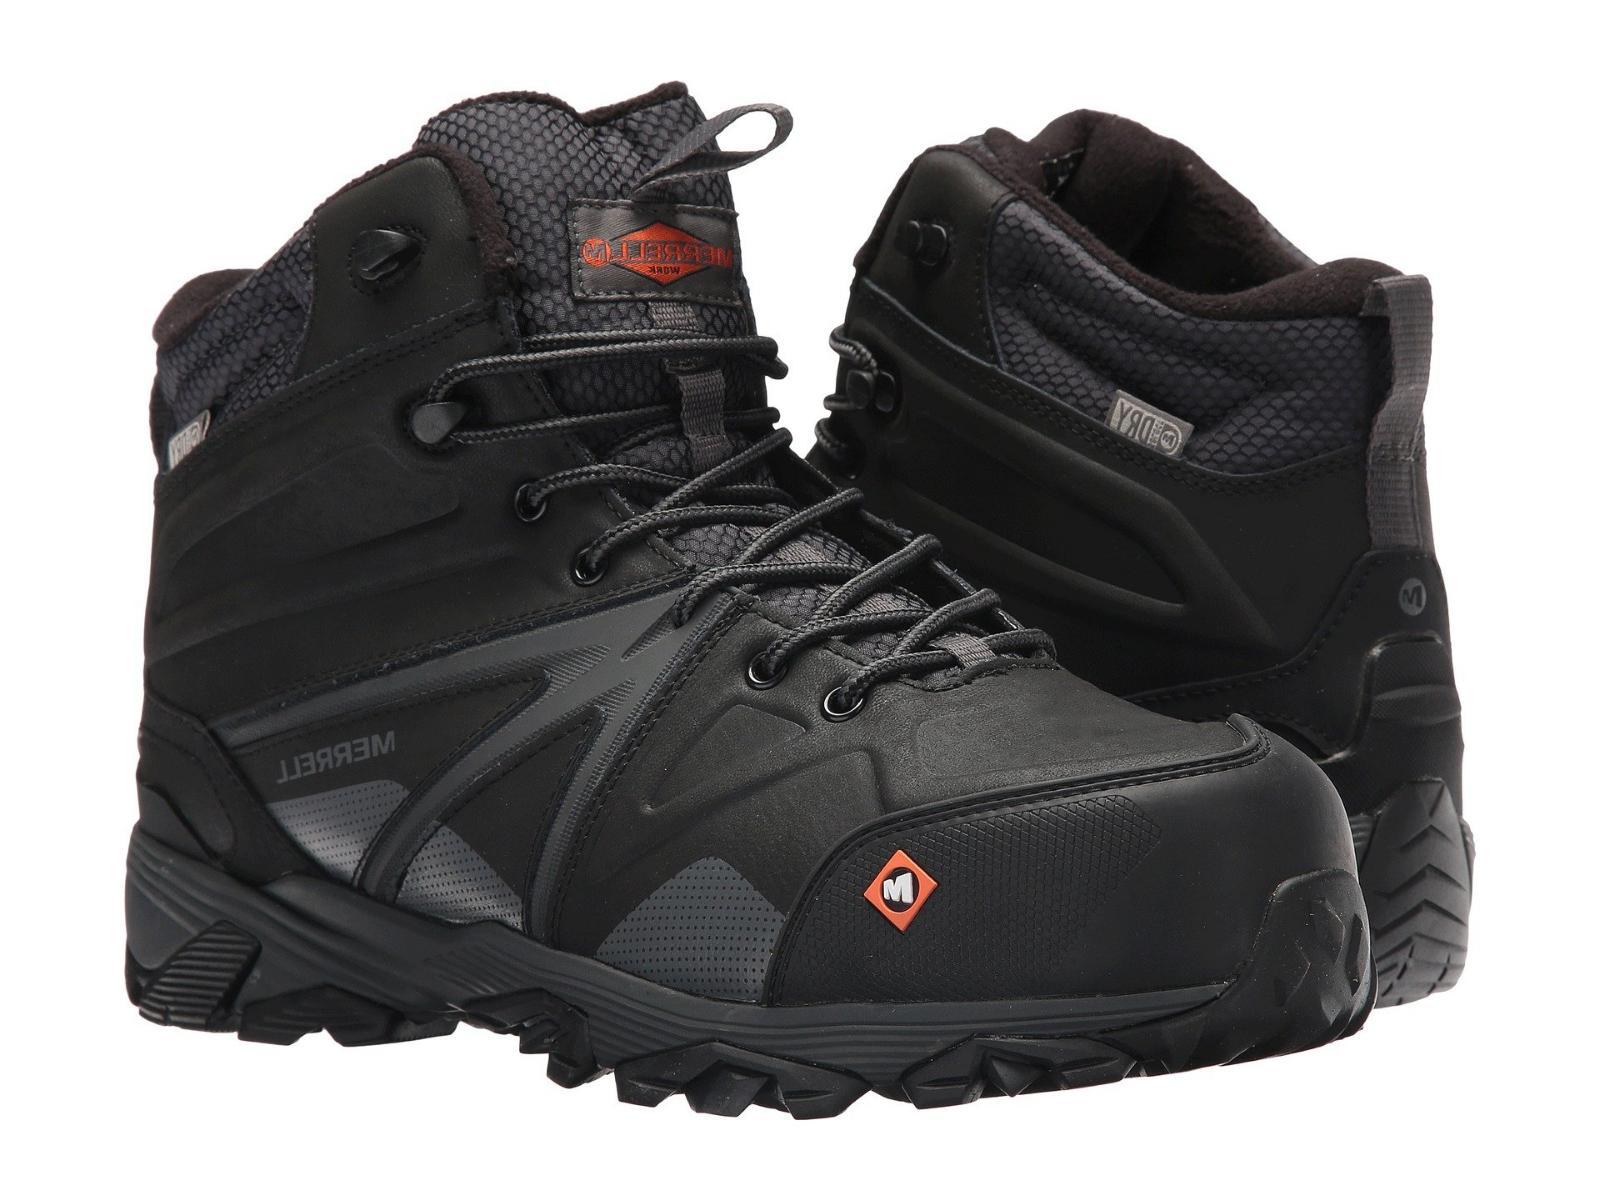 trailwork mid ct hiking work boots waterproof